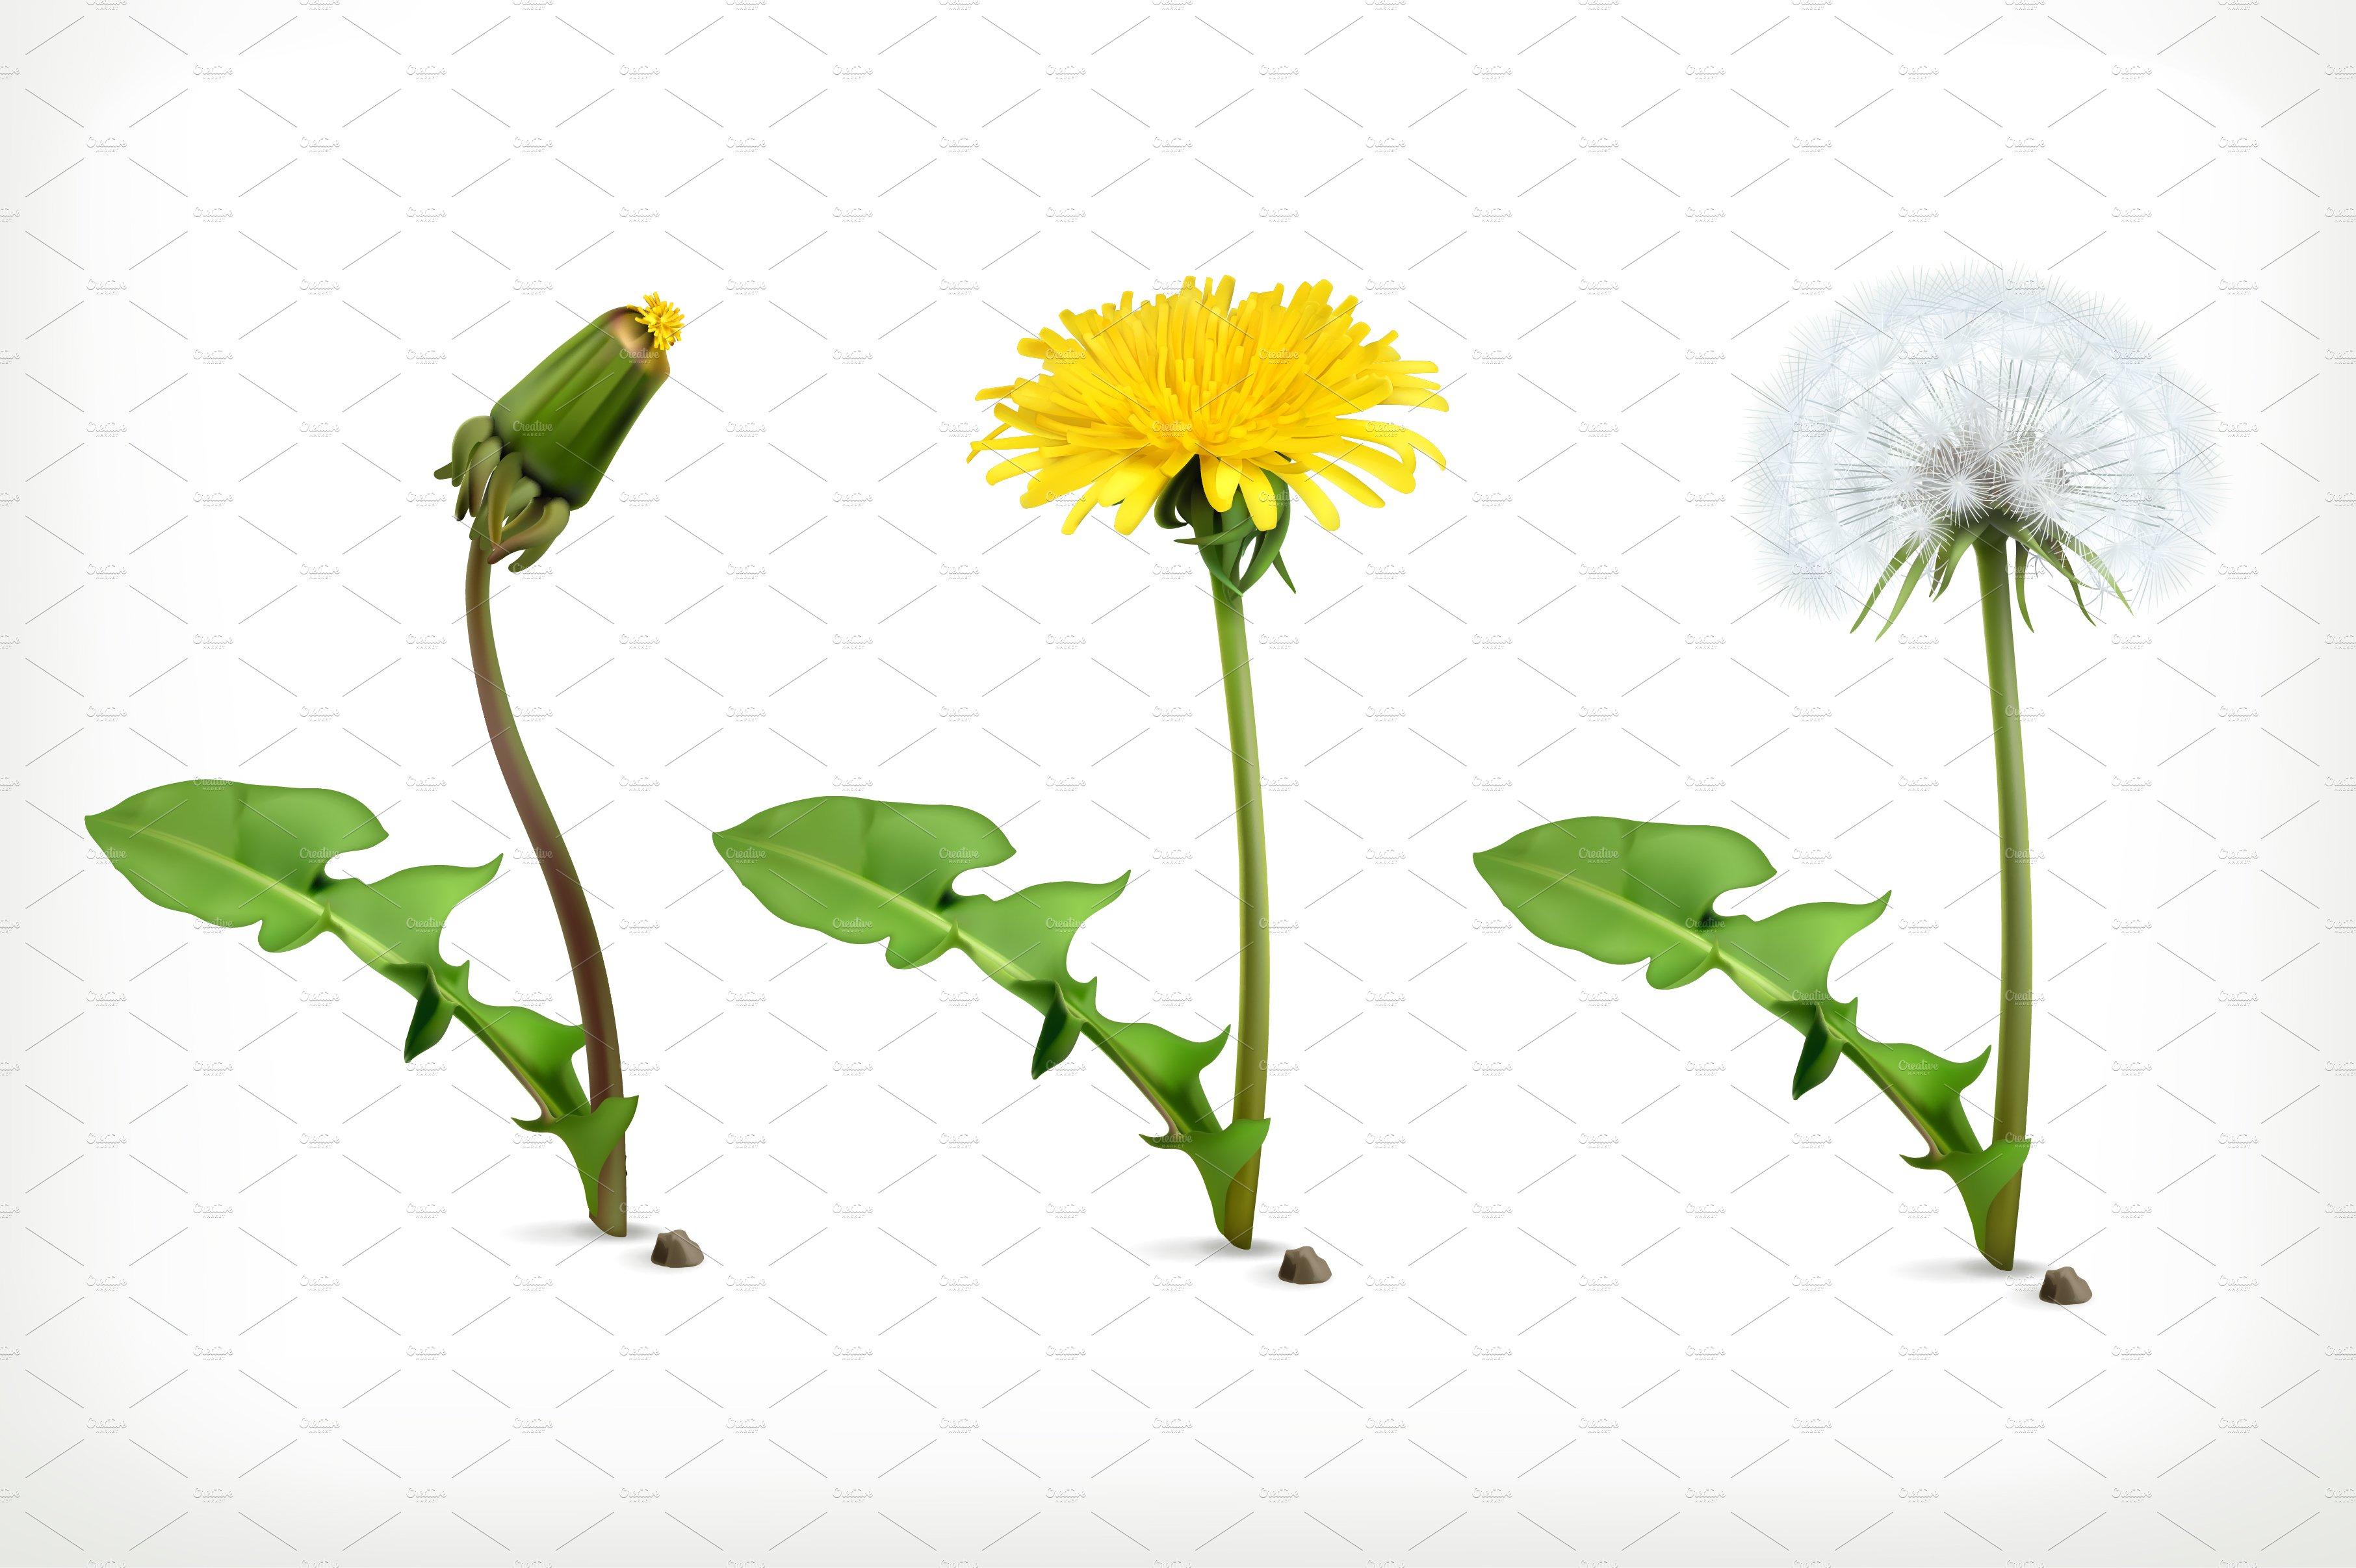 Dandelion flowers vector icons ~ Illustrations ~ Creative ...